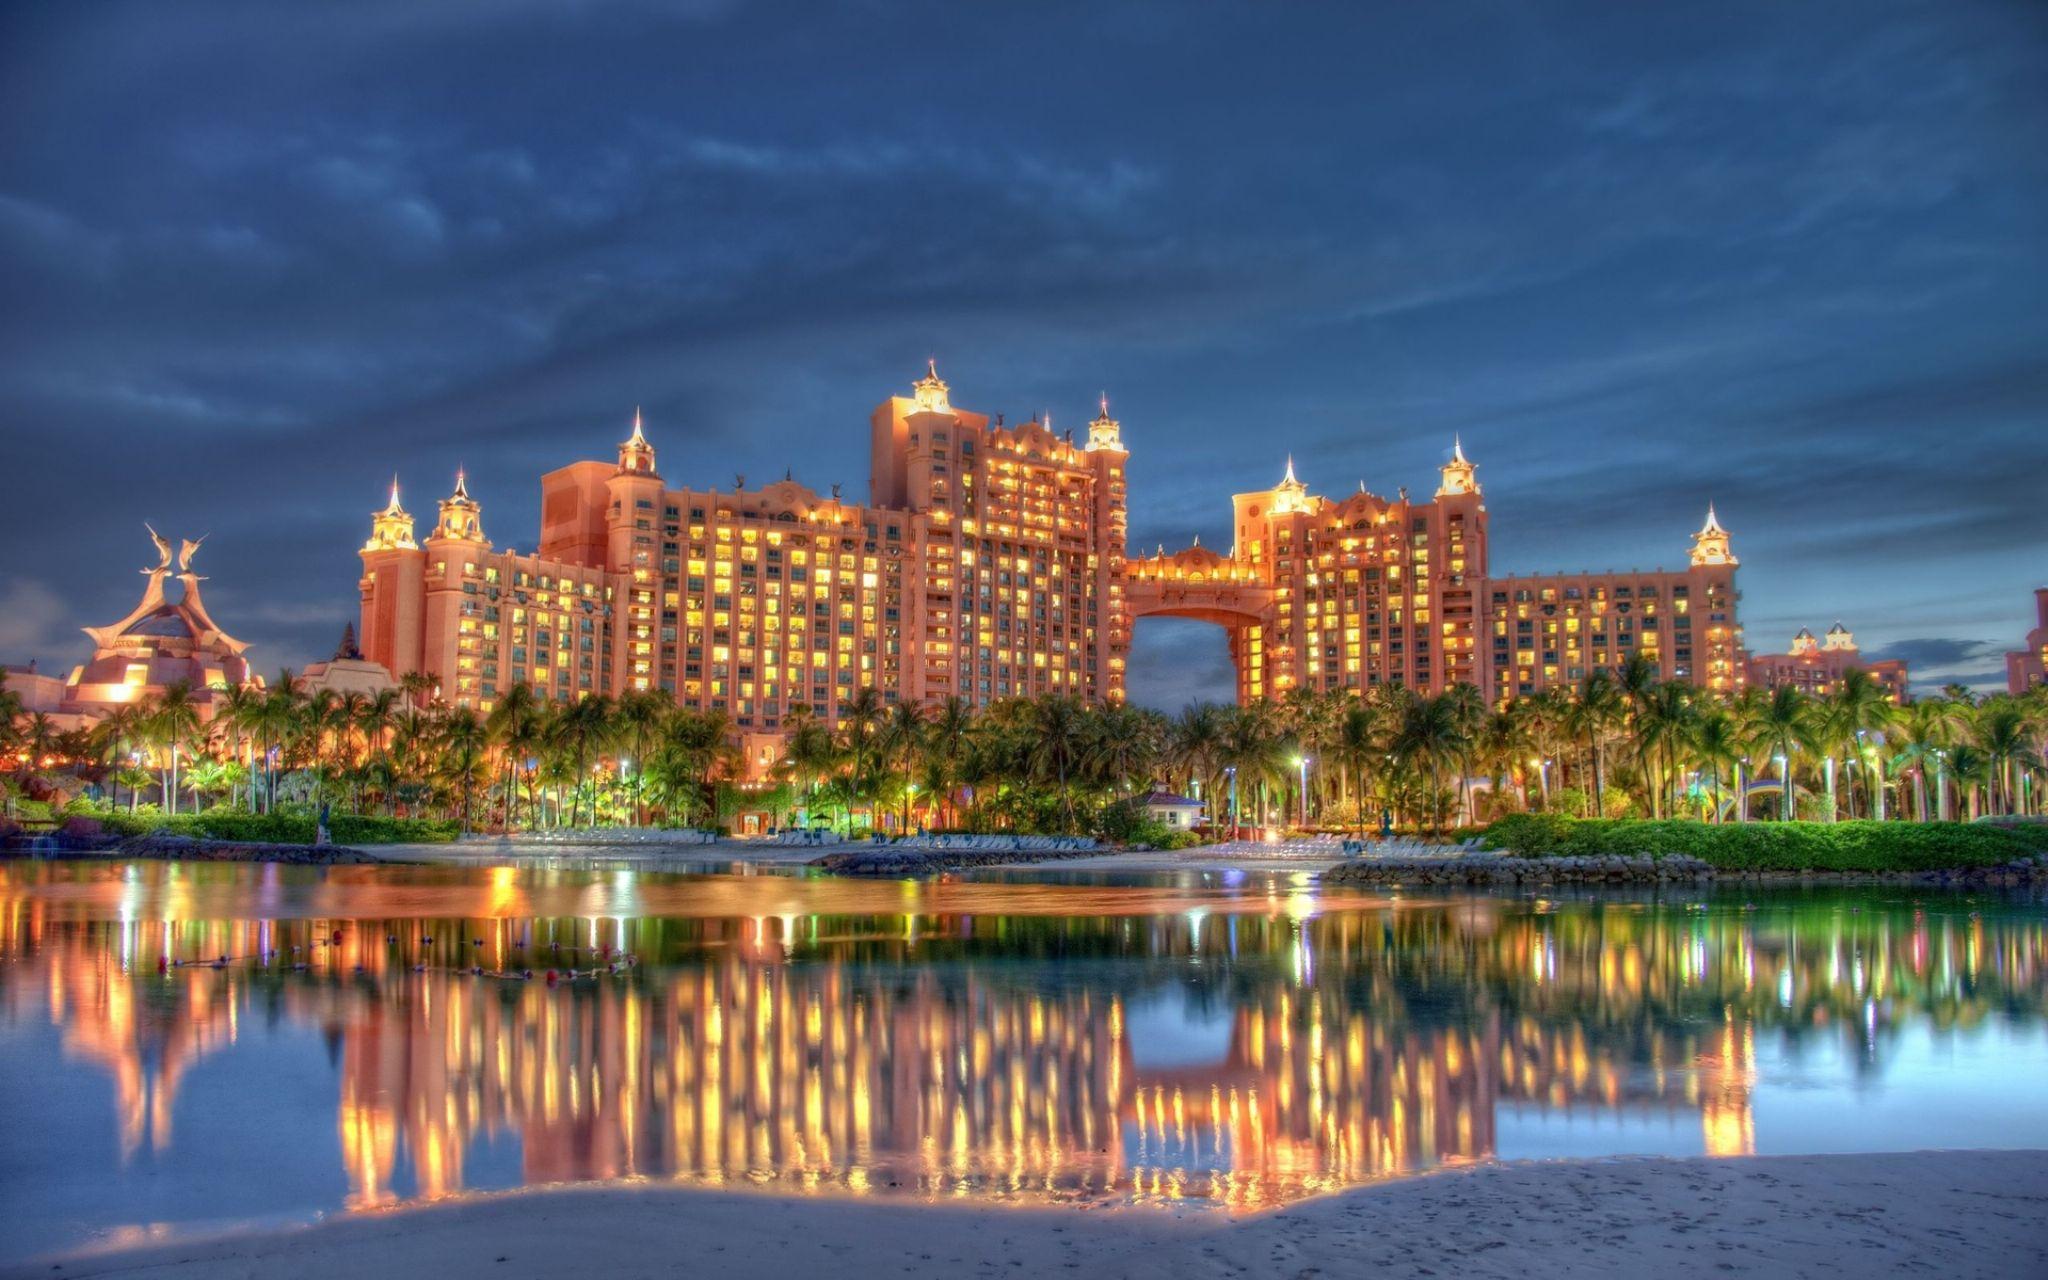 Atlantis Bahamas by Digital Kafe Photography